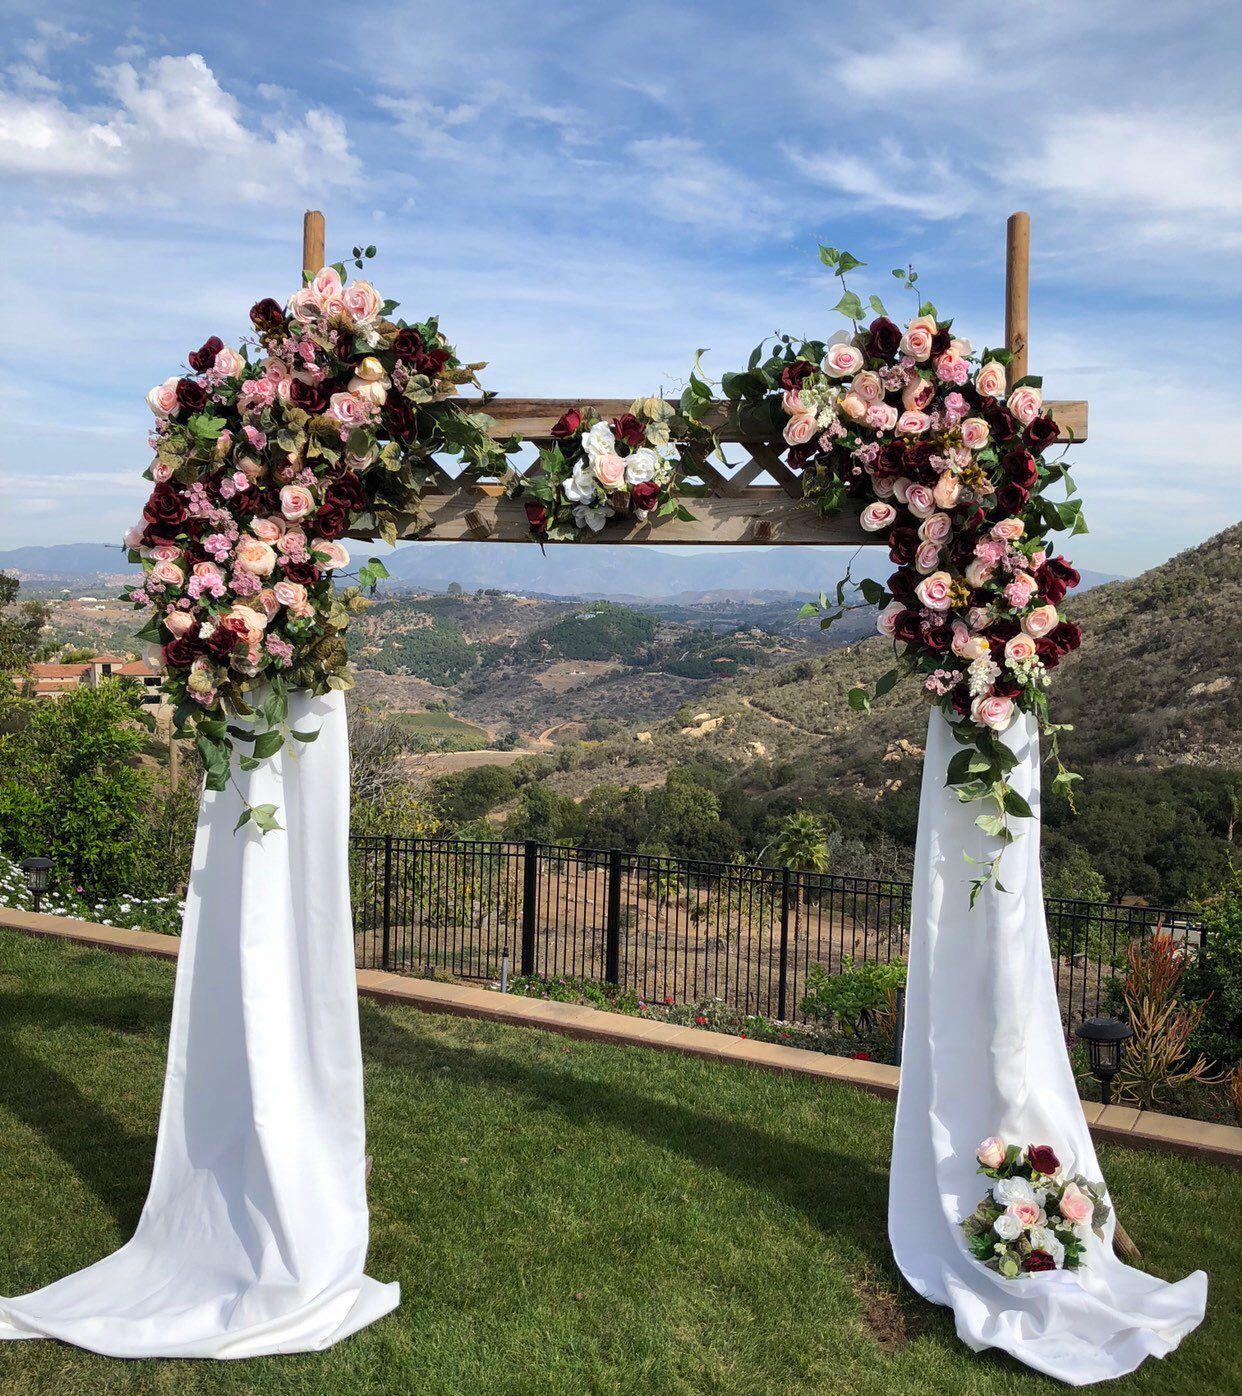 Burgundy Blush Wedding Ceremony Arch, Lux Burgundy Wedding